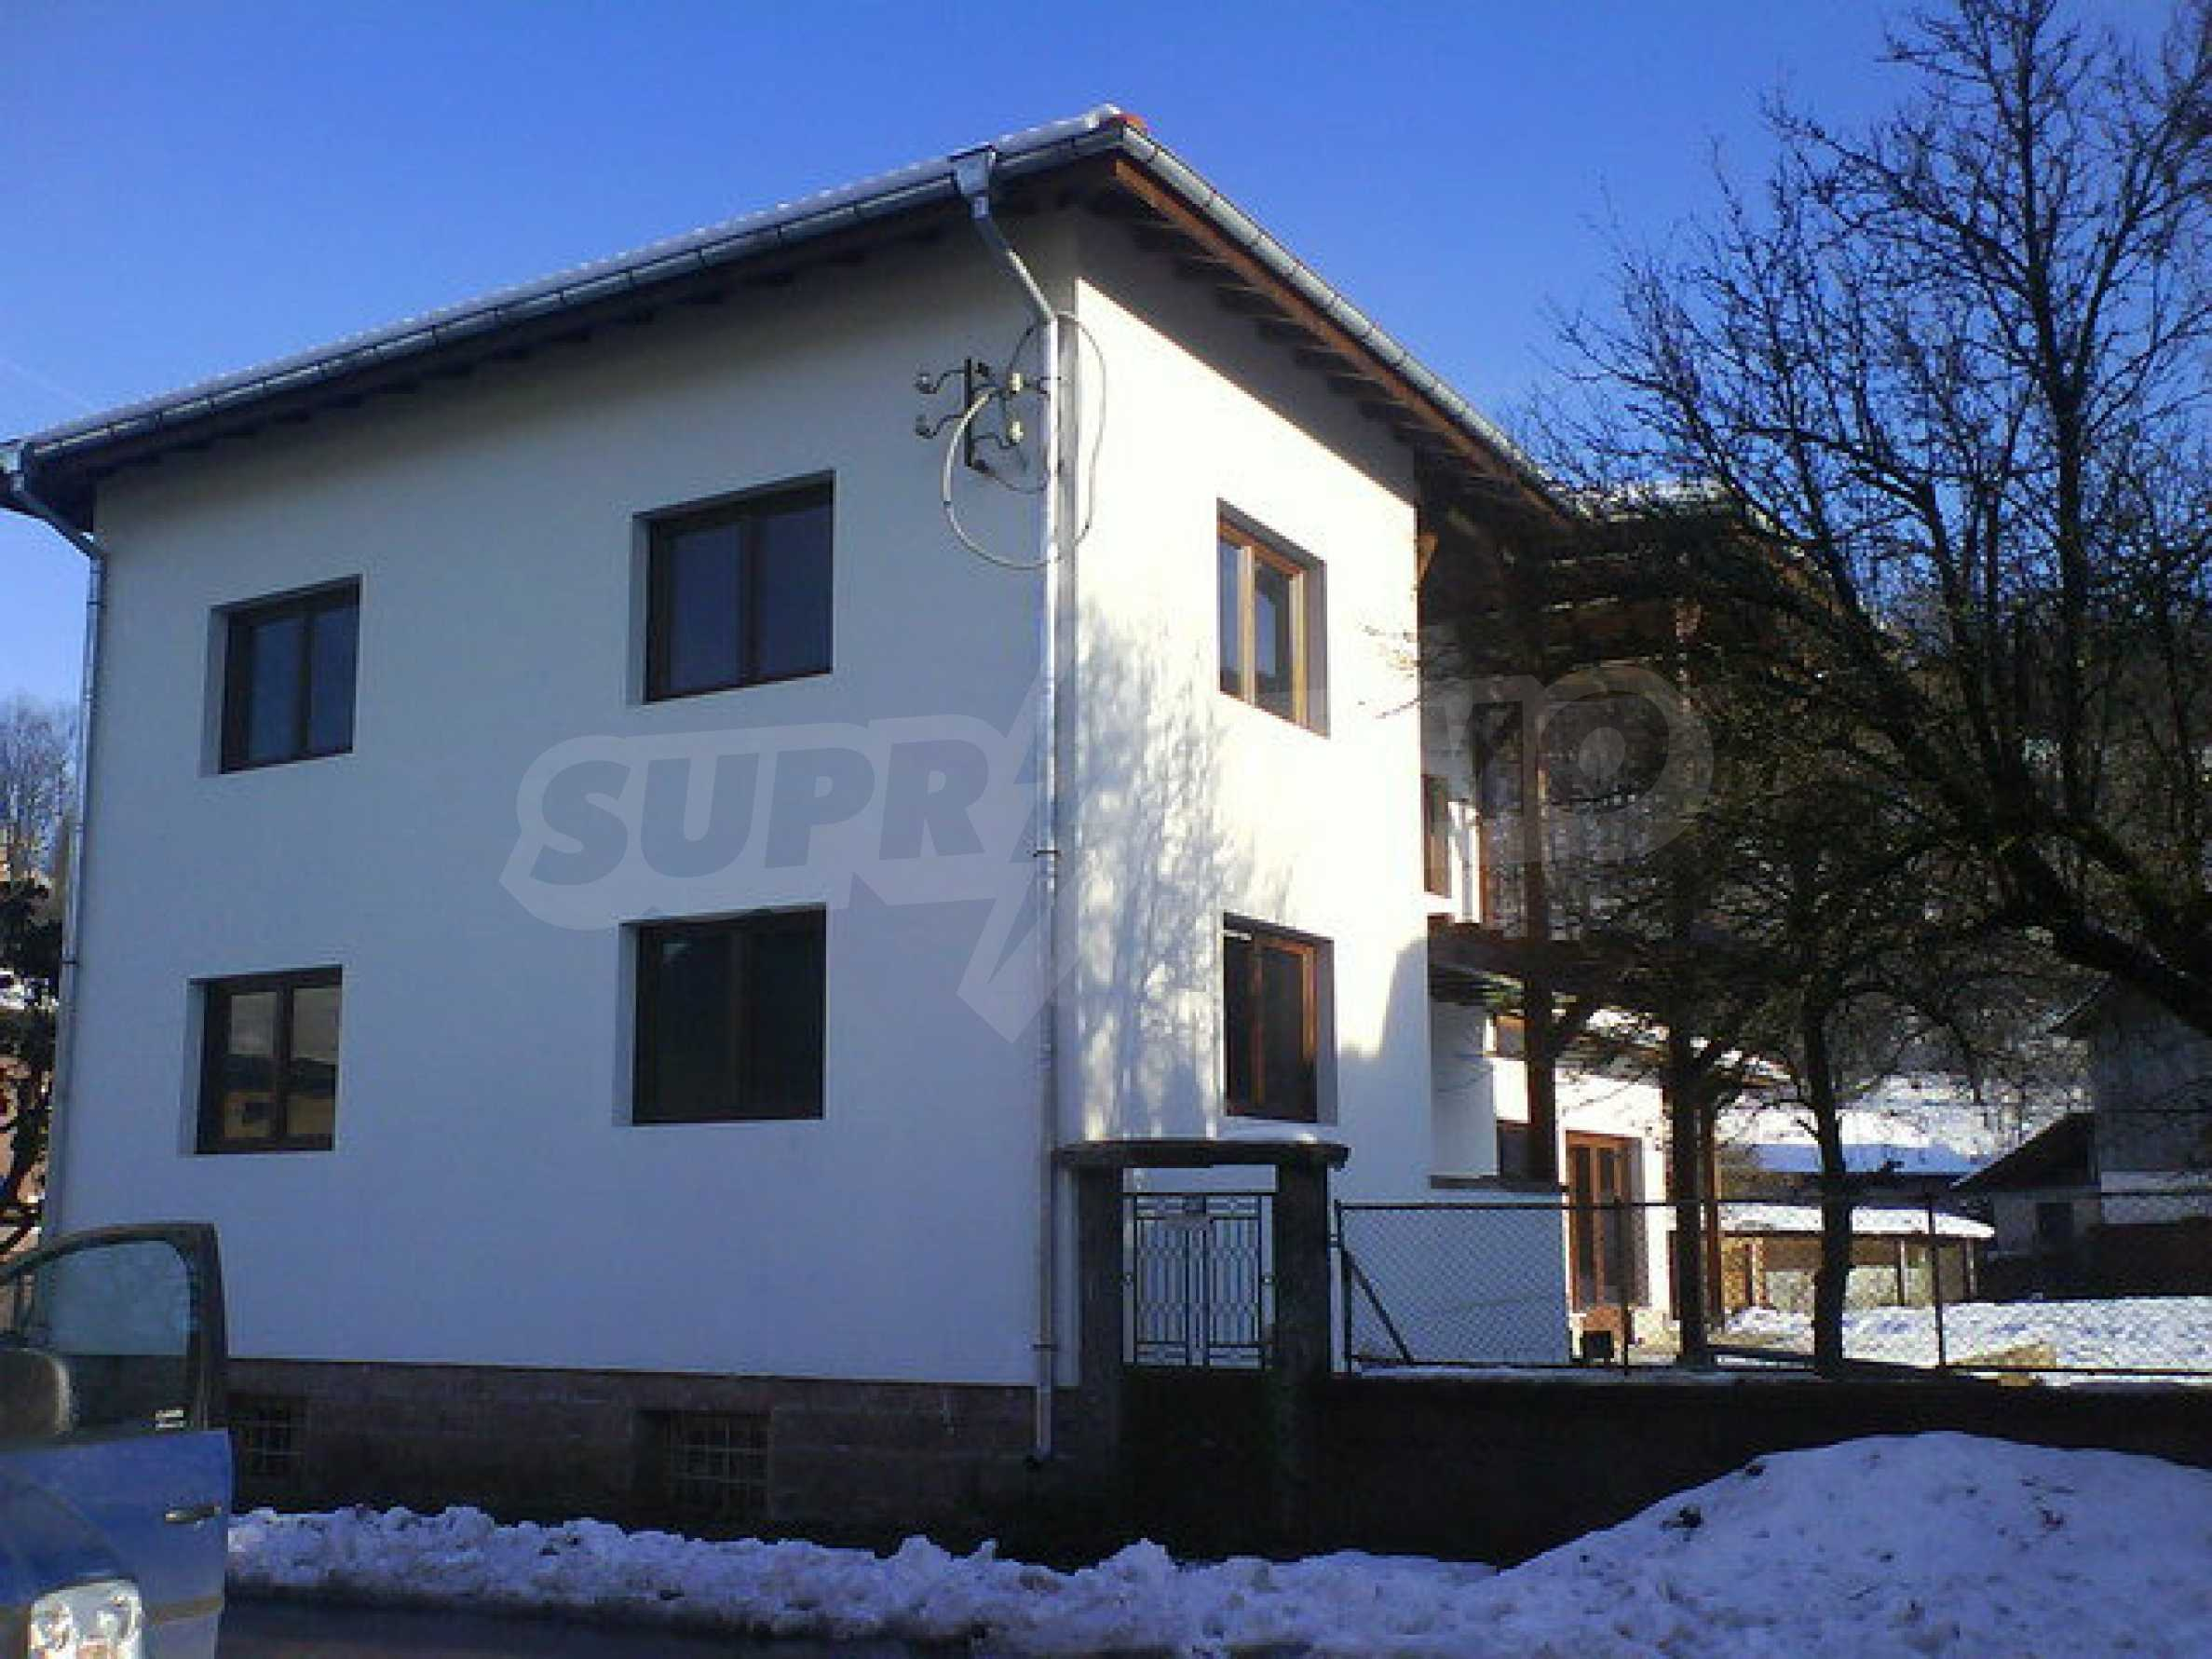 Two storey house in village near Sopot Dam 2